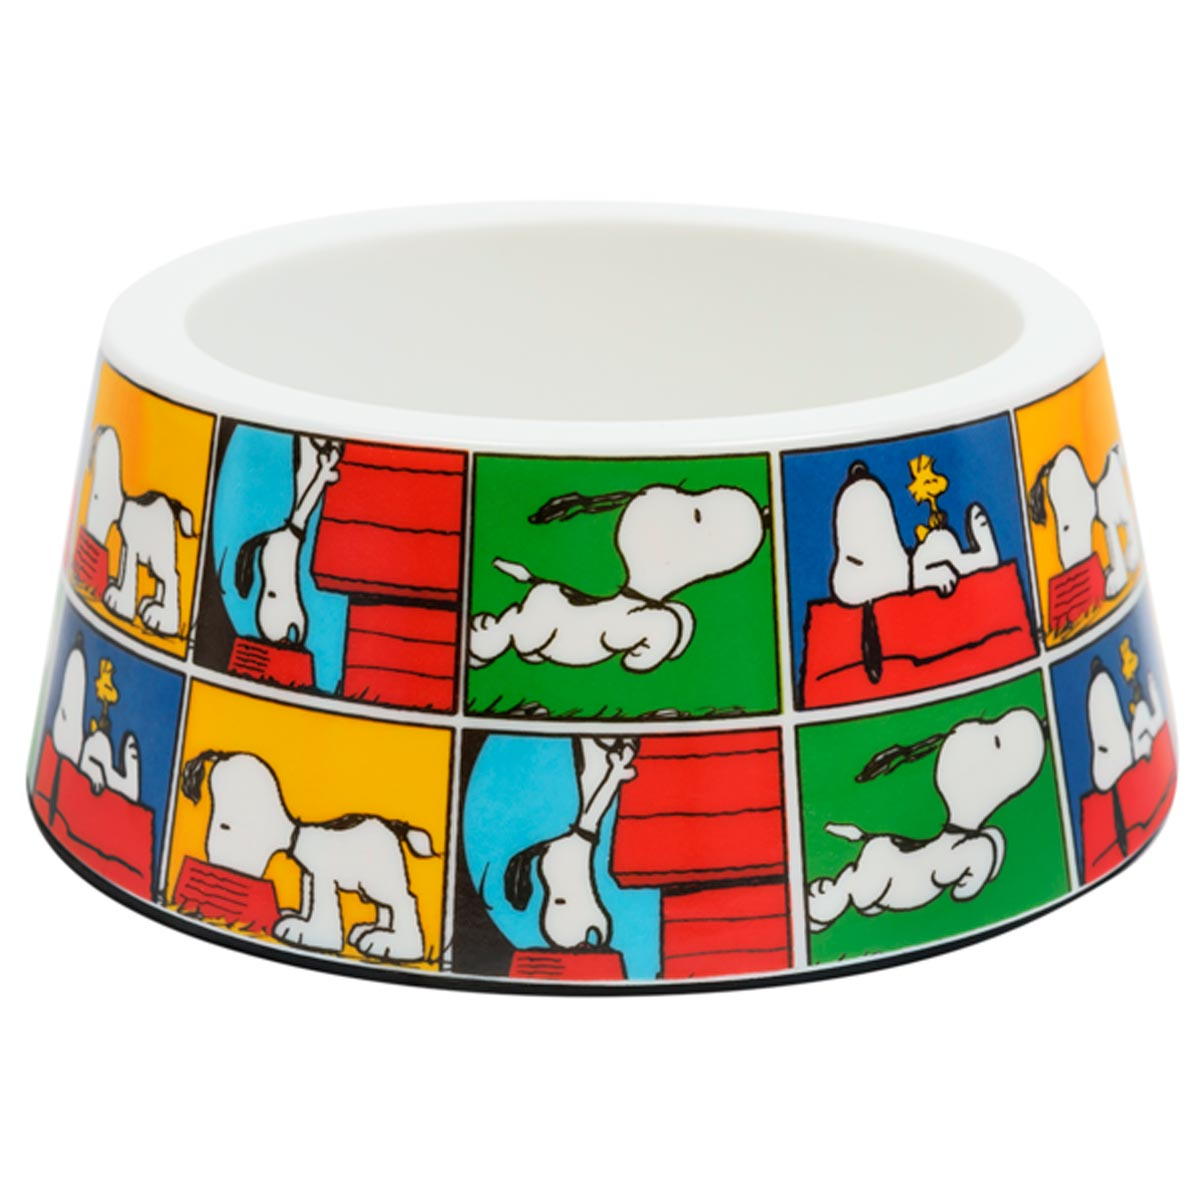 Comedouro para Cachorro Melanina Snoopy Quadradinho Zooz Pets